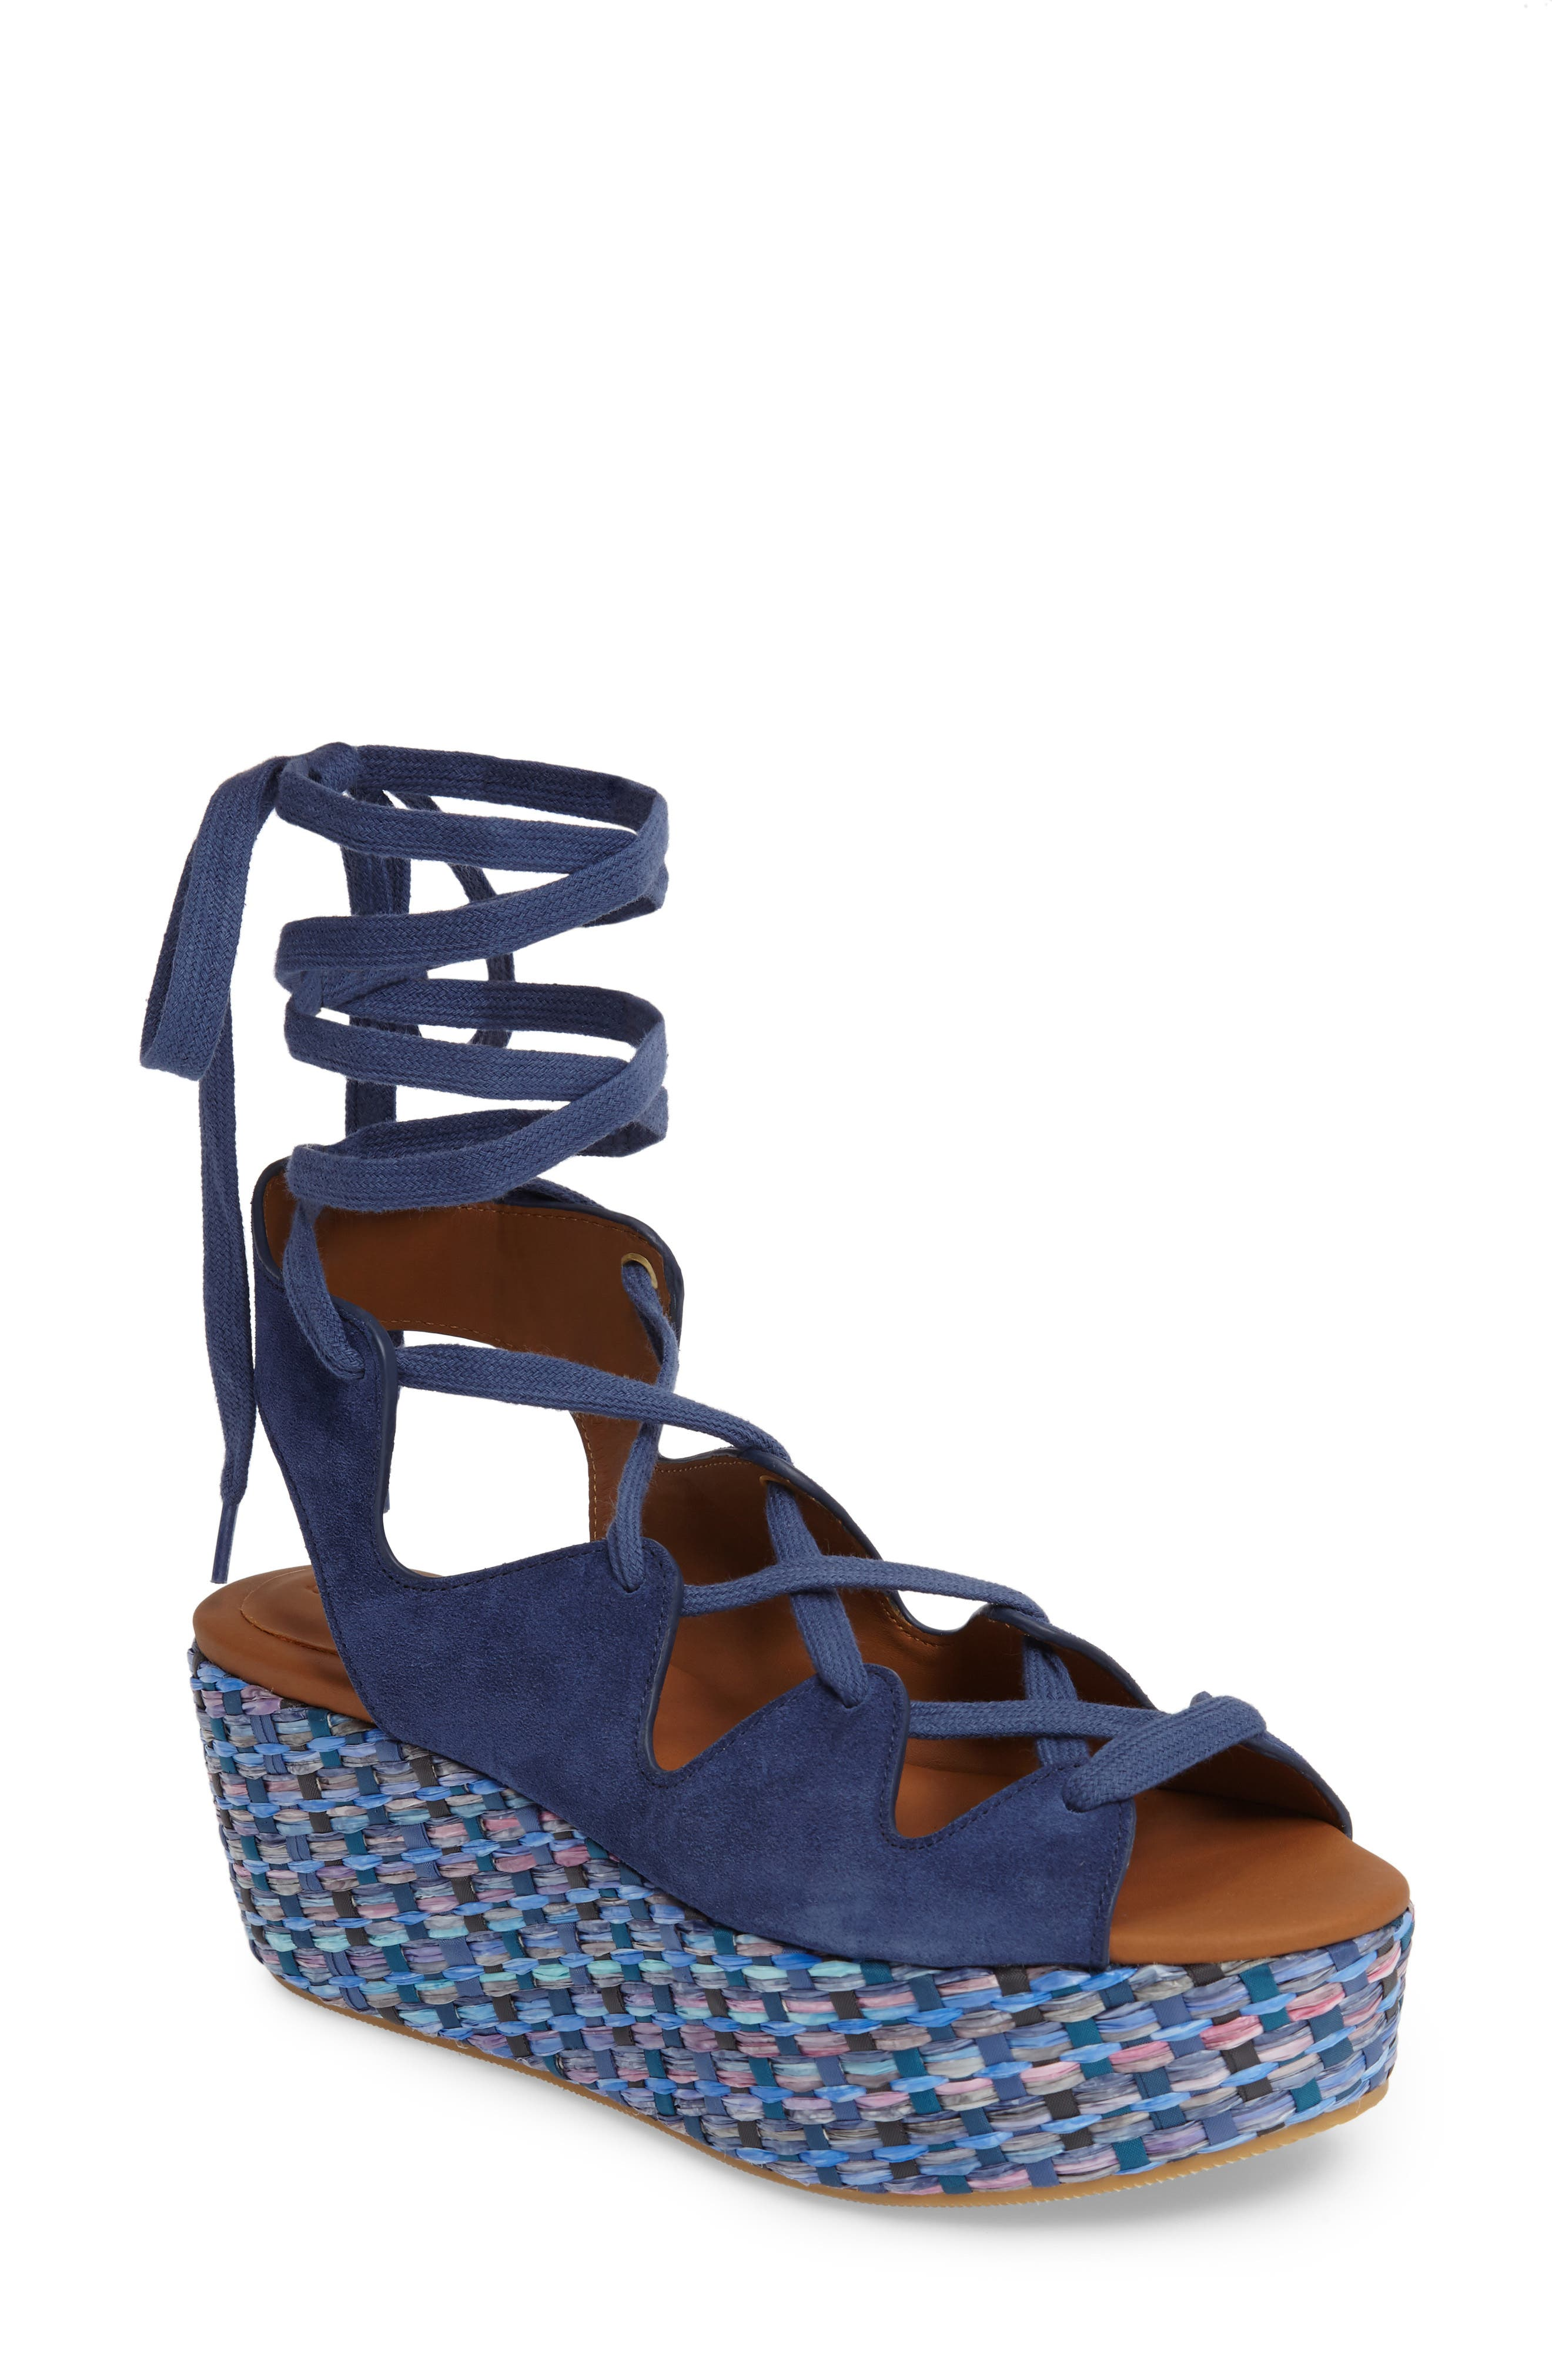 SEE BY CHLOÉ Liana Platform Wedge Sandal